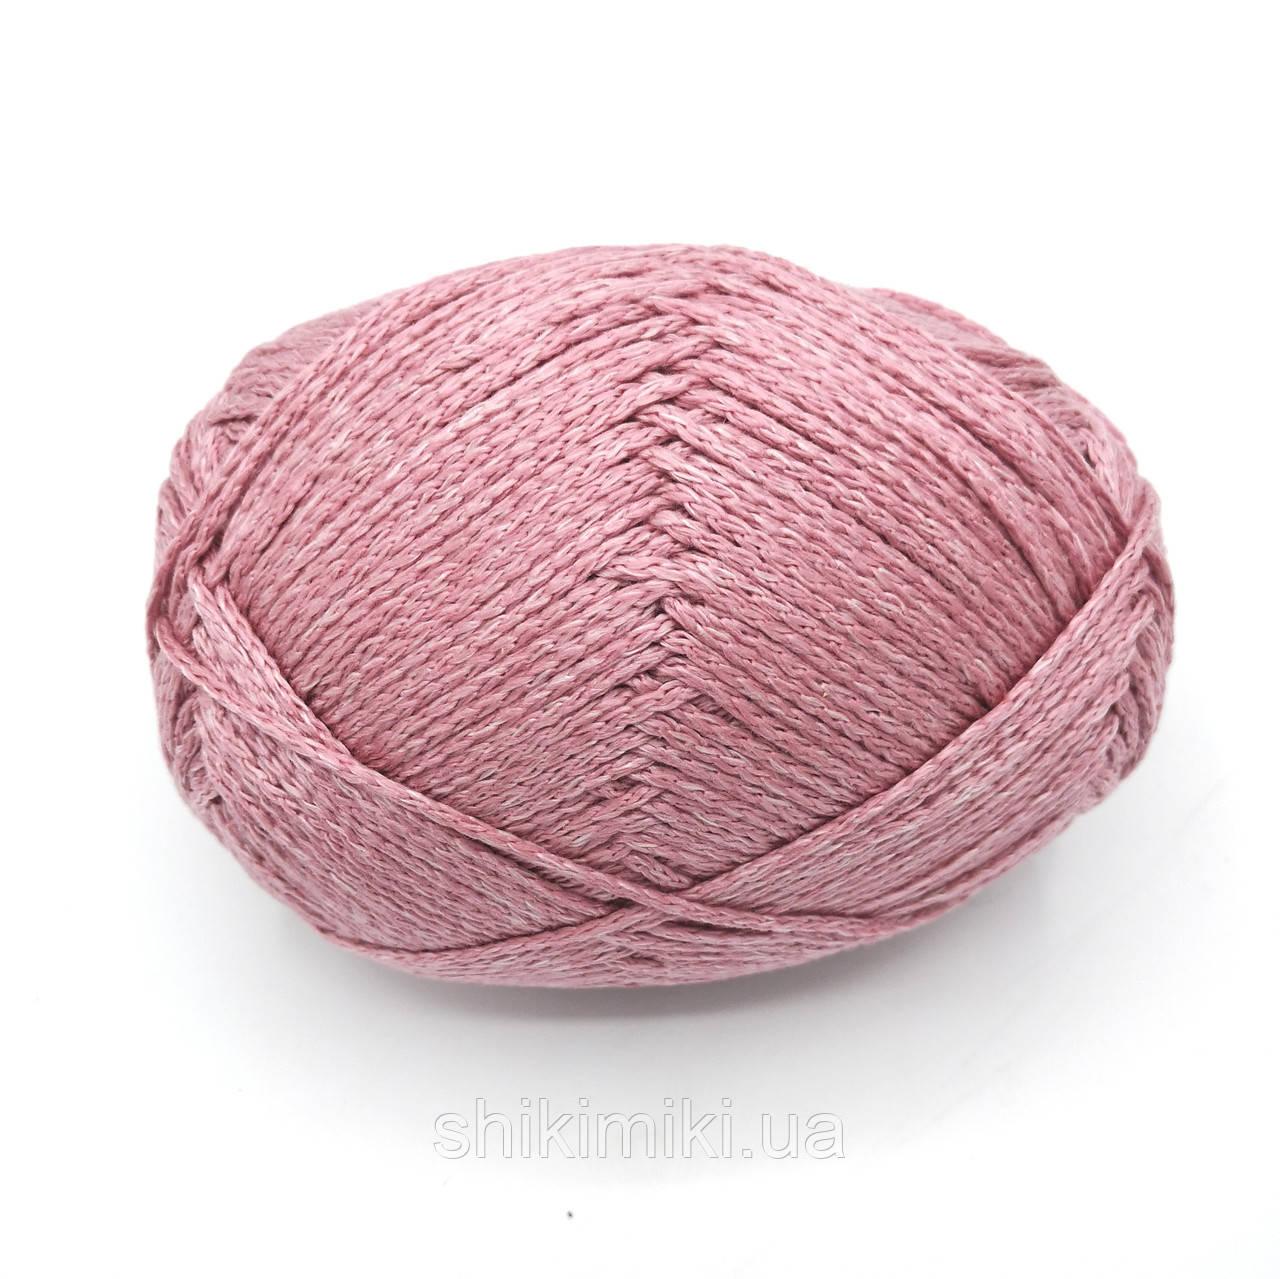 Трикотажный шнур PP Tie Dye, цвет Пастельно-розовый